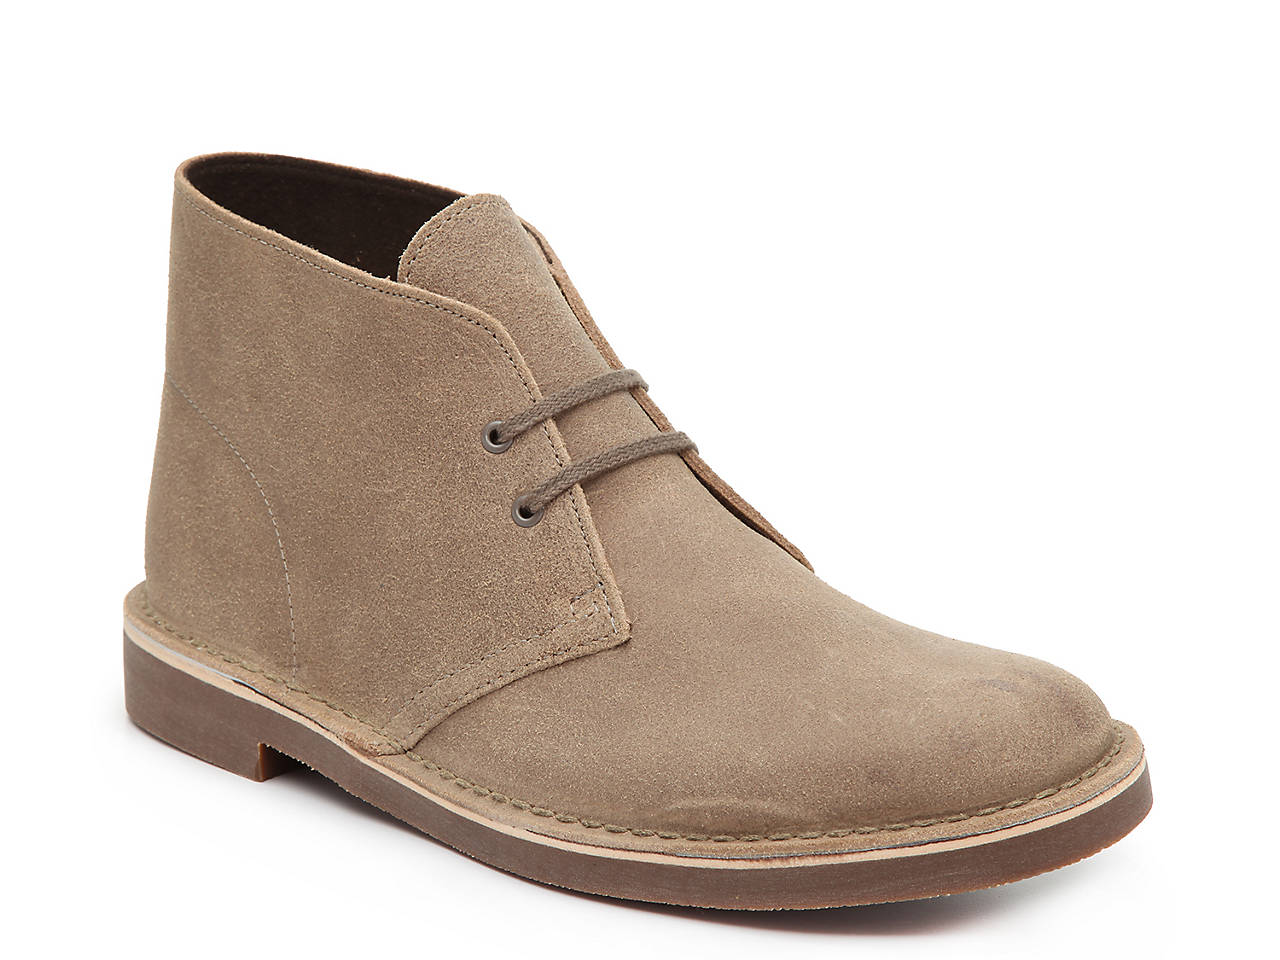 54ee4a14ba1 Clarks Bushacre 2 Chukka Boot Men's Shoes | DSW